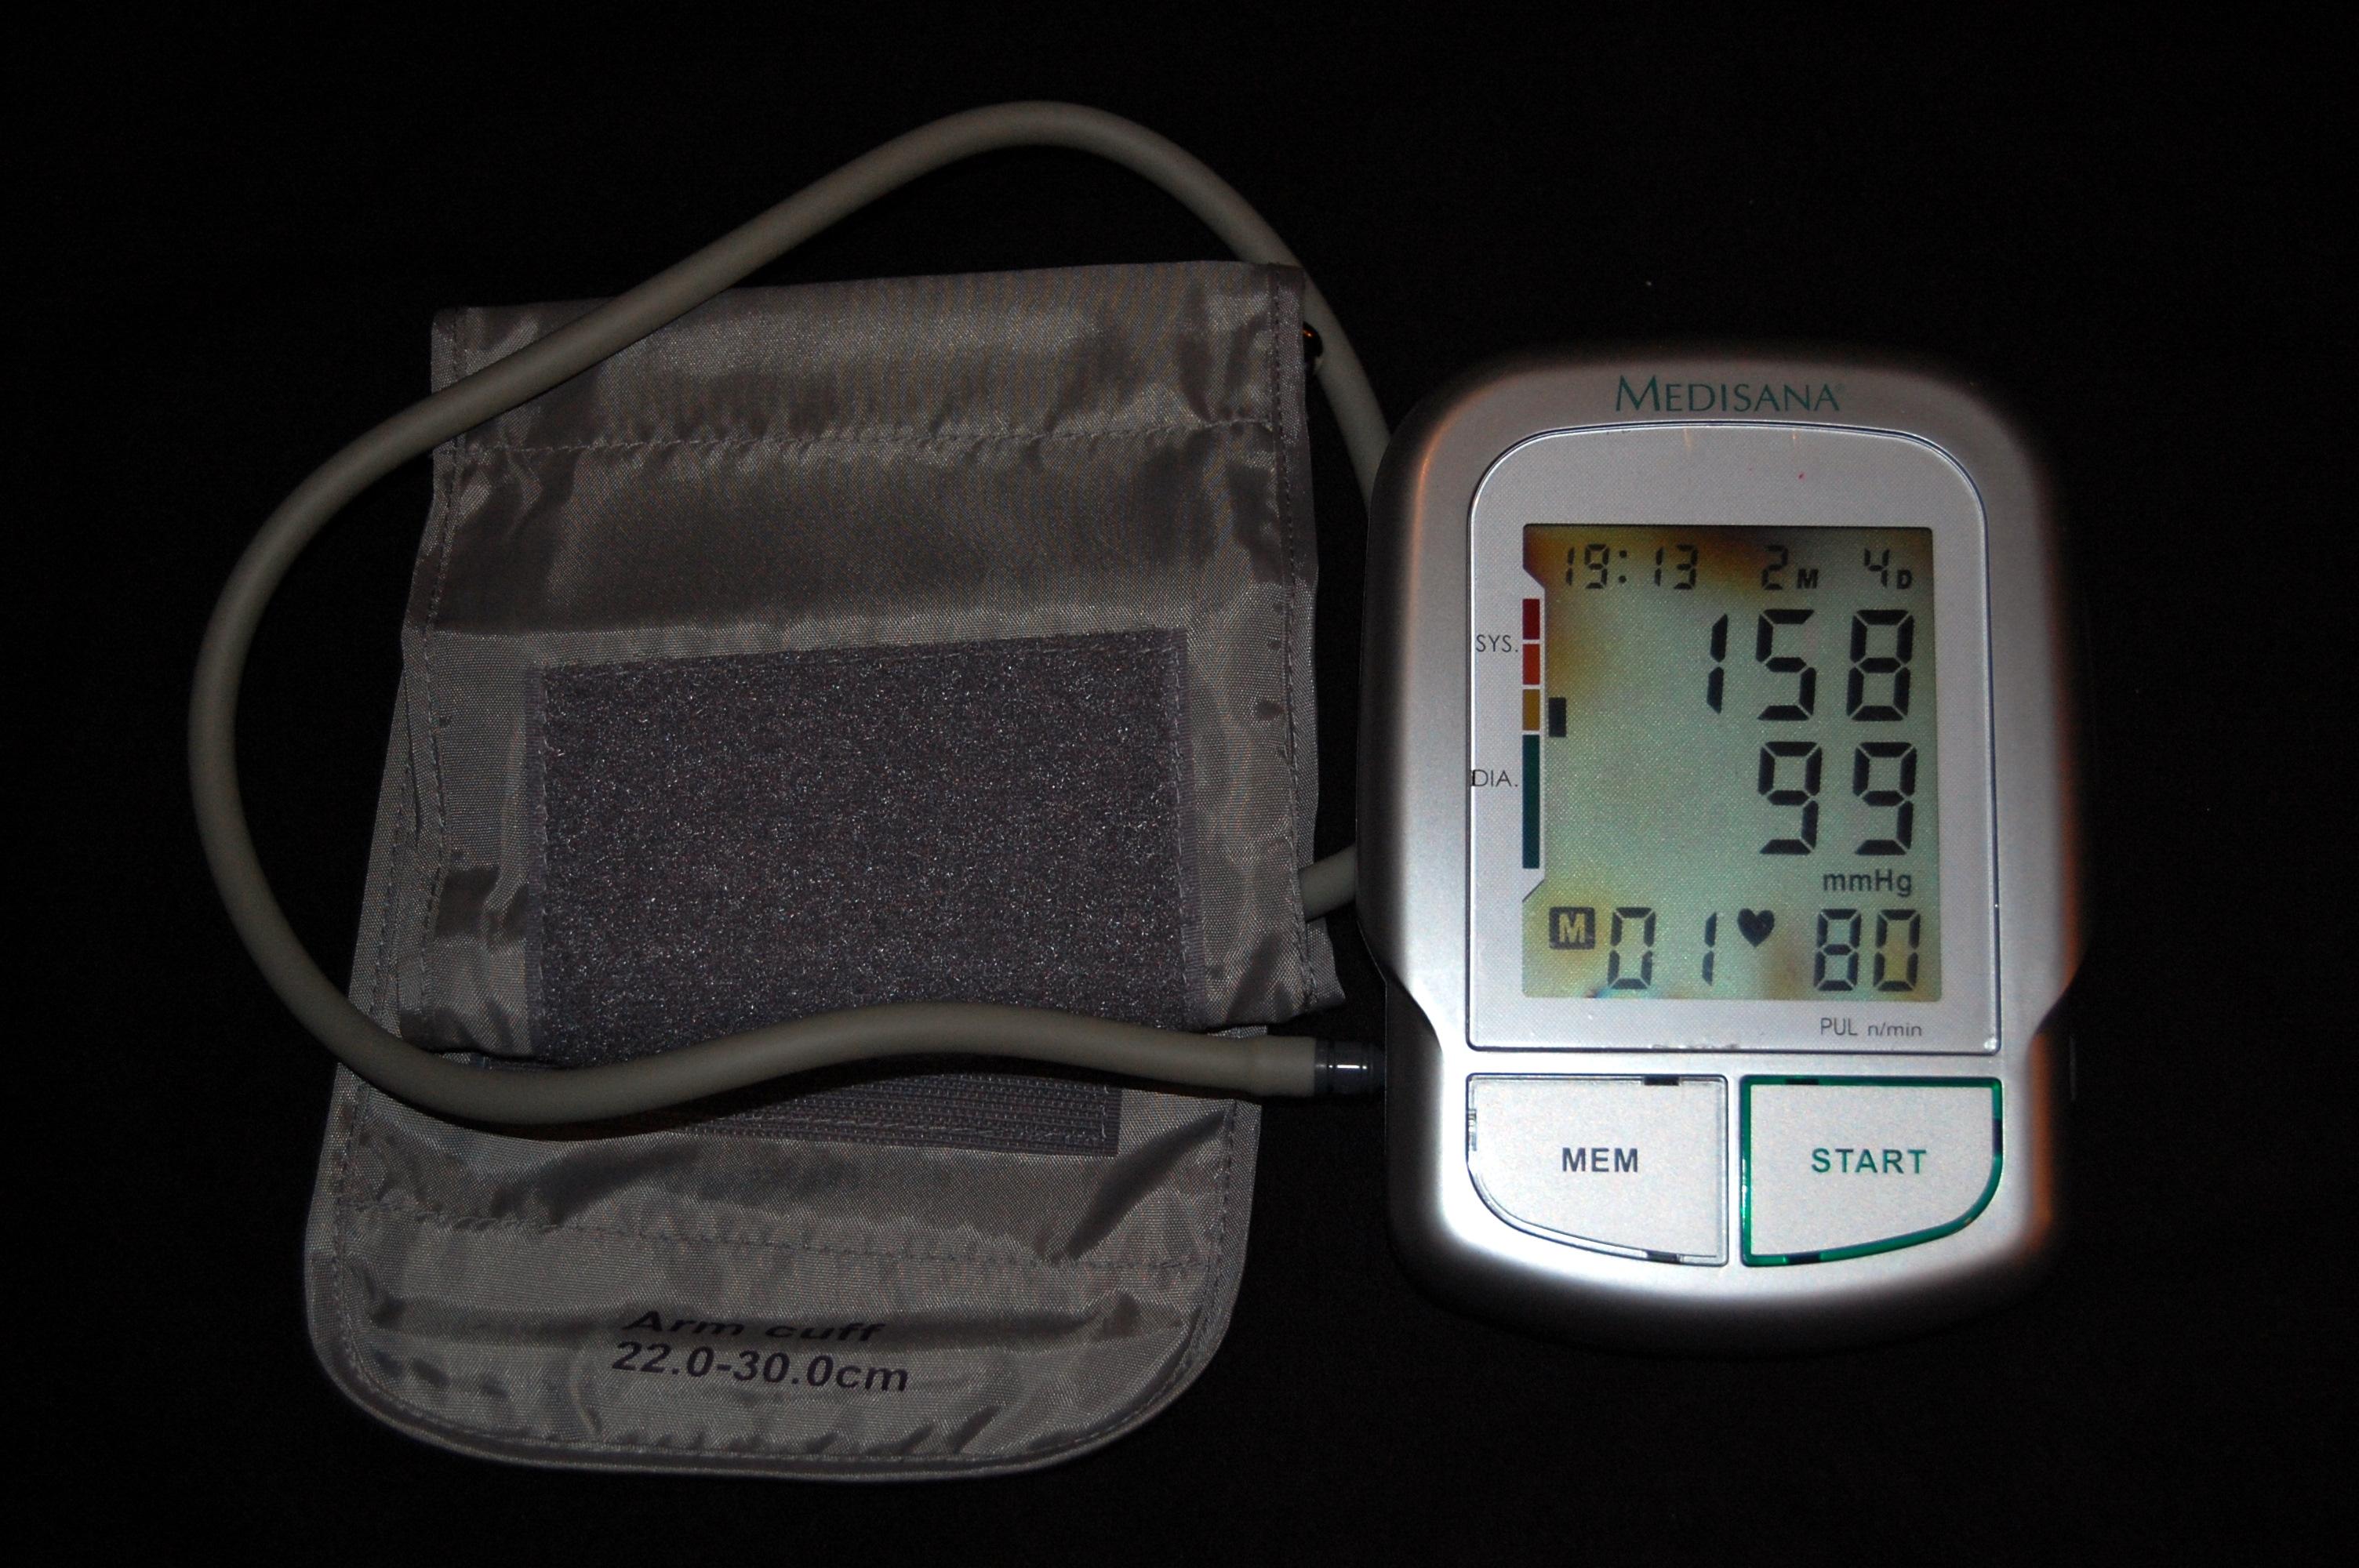 vijek s hipertenzijom